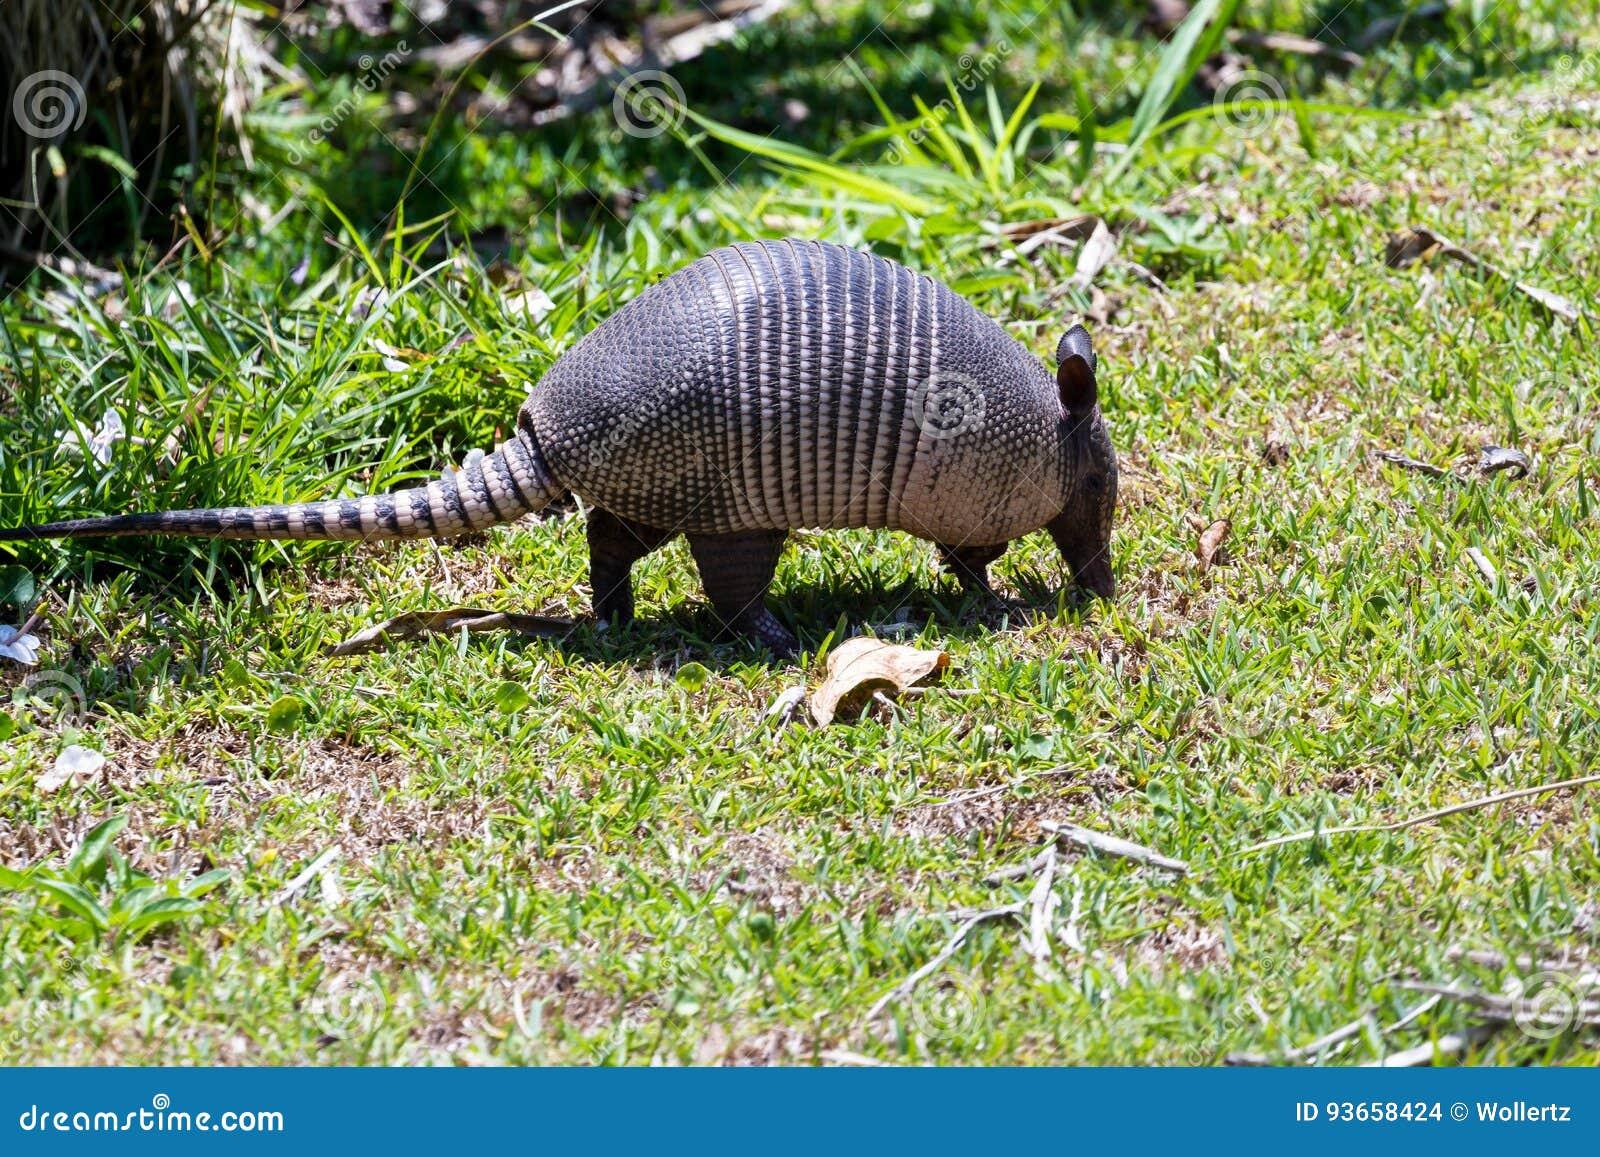 Nine-banded armadillo- Dasypus novemcinctus